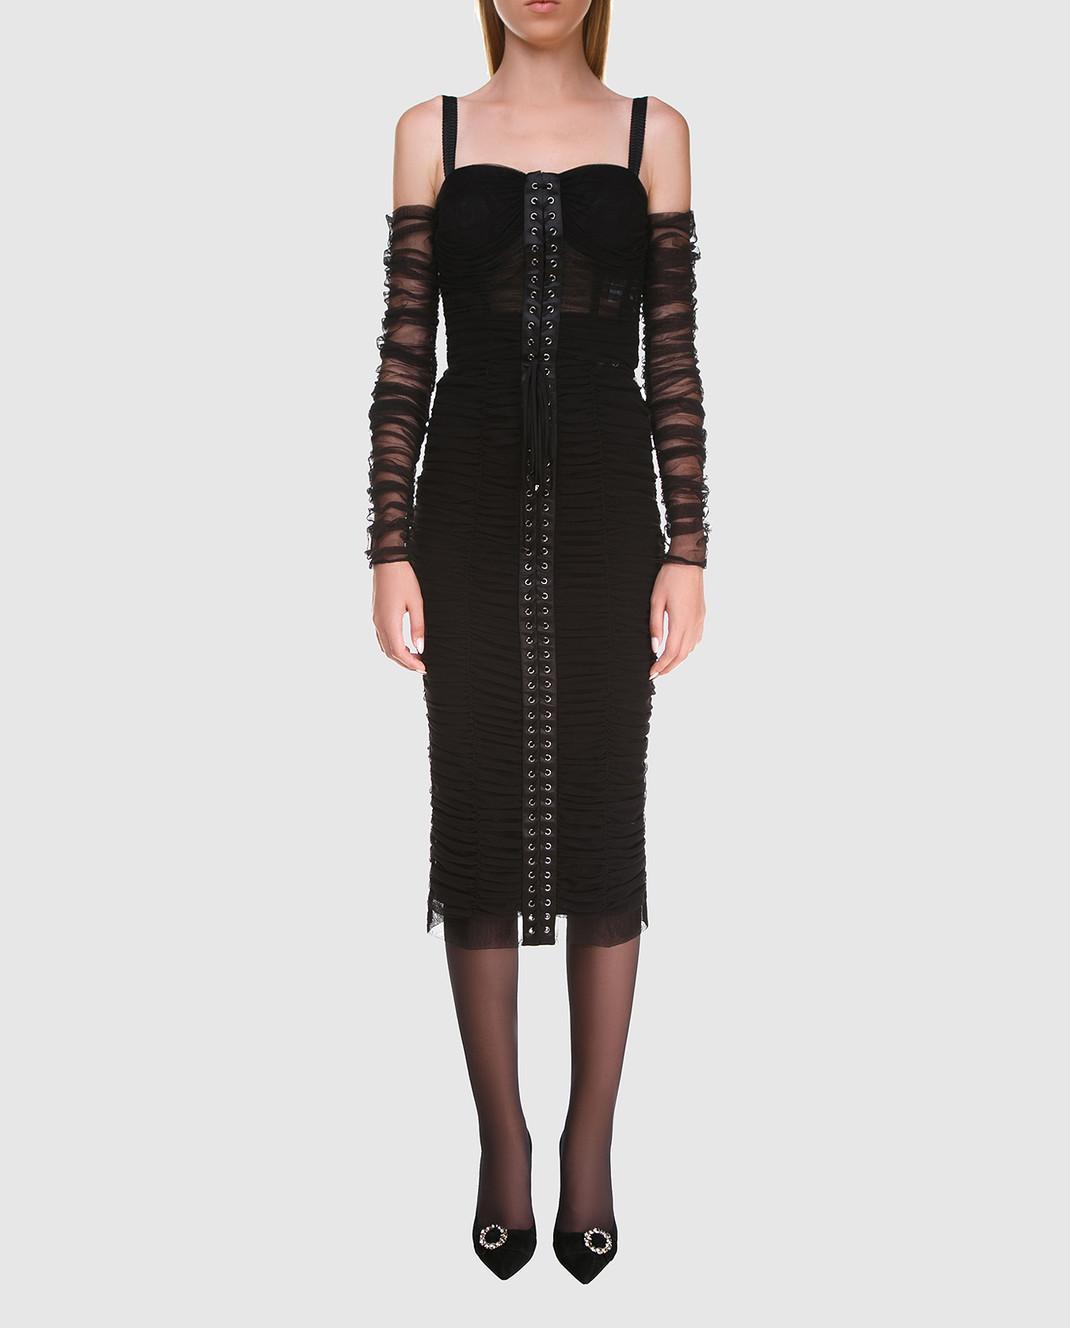 Dolce&Gabbana Черное платье F6A9QTFLEAA изображение 2